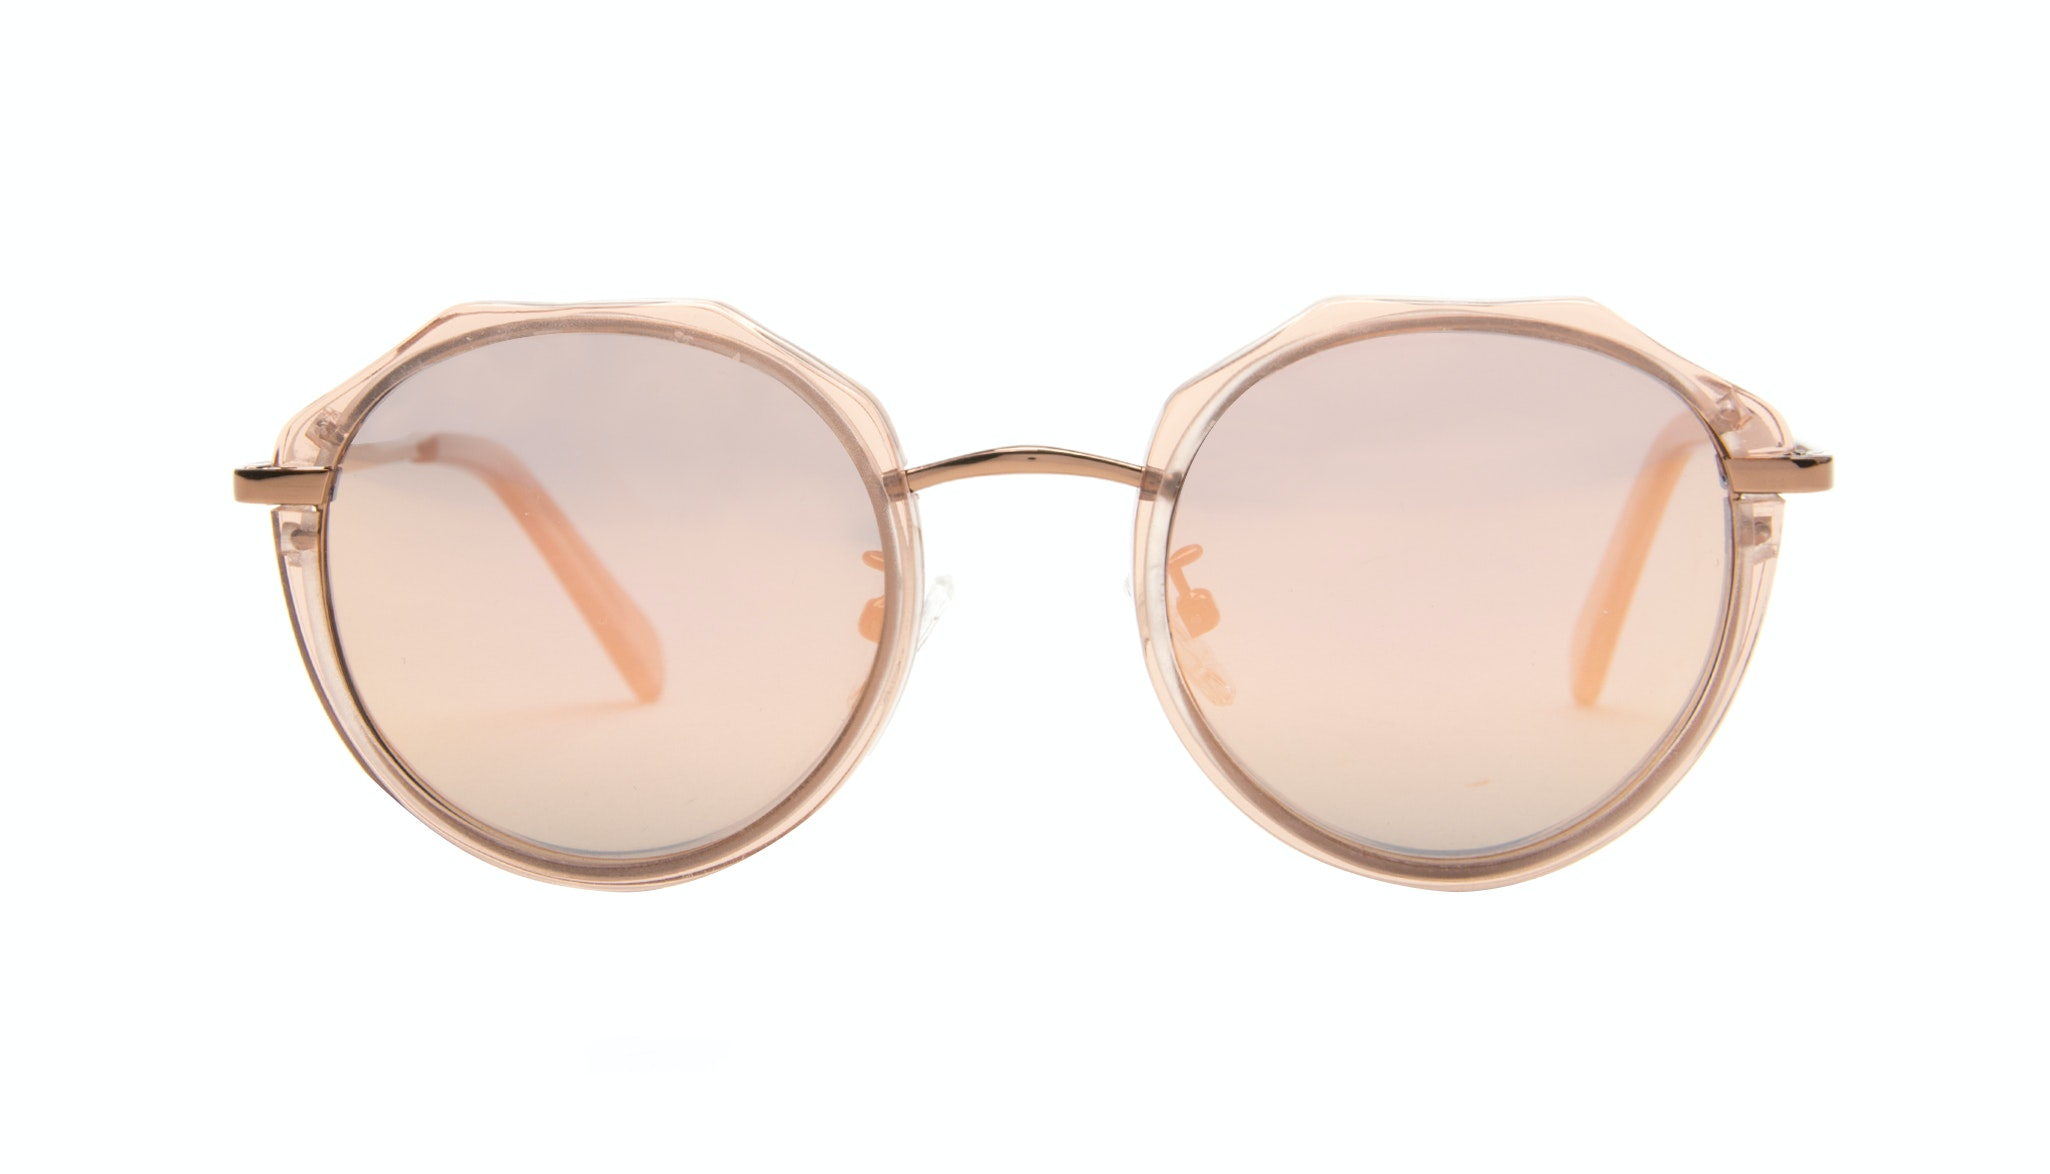 Affordable Fashion Glasses Round Sunglasses Women Vitality Rose